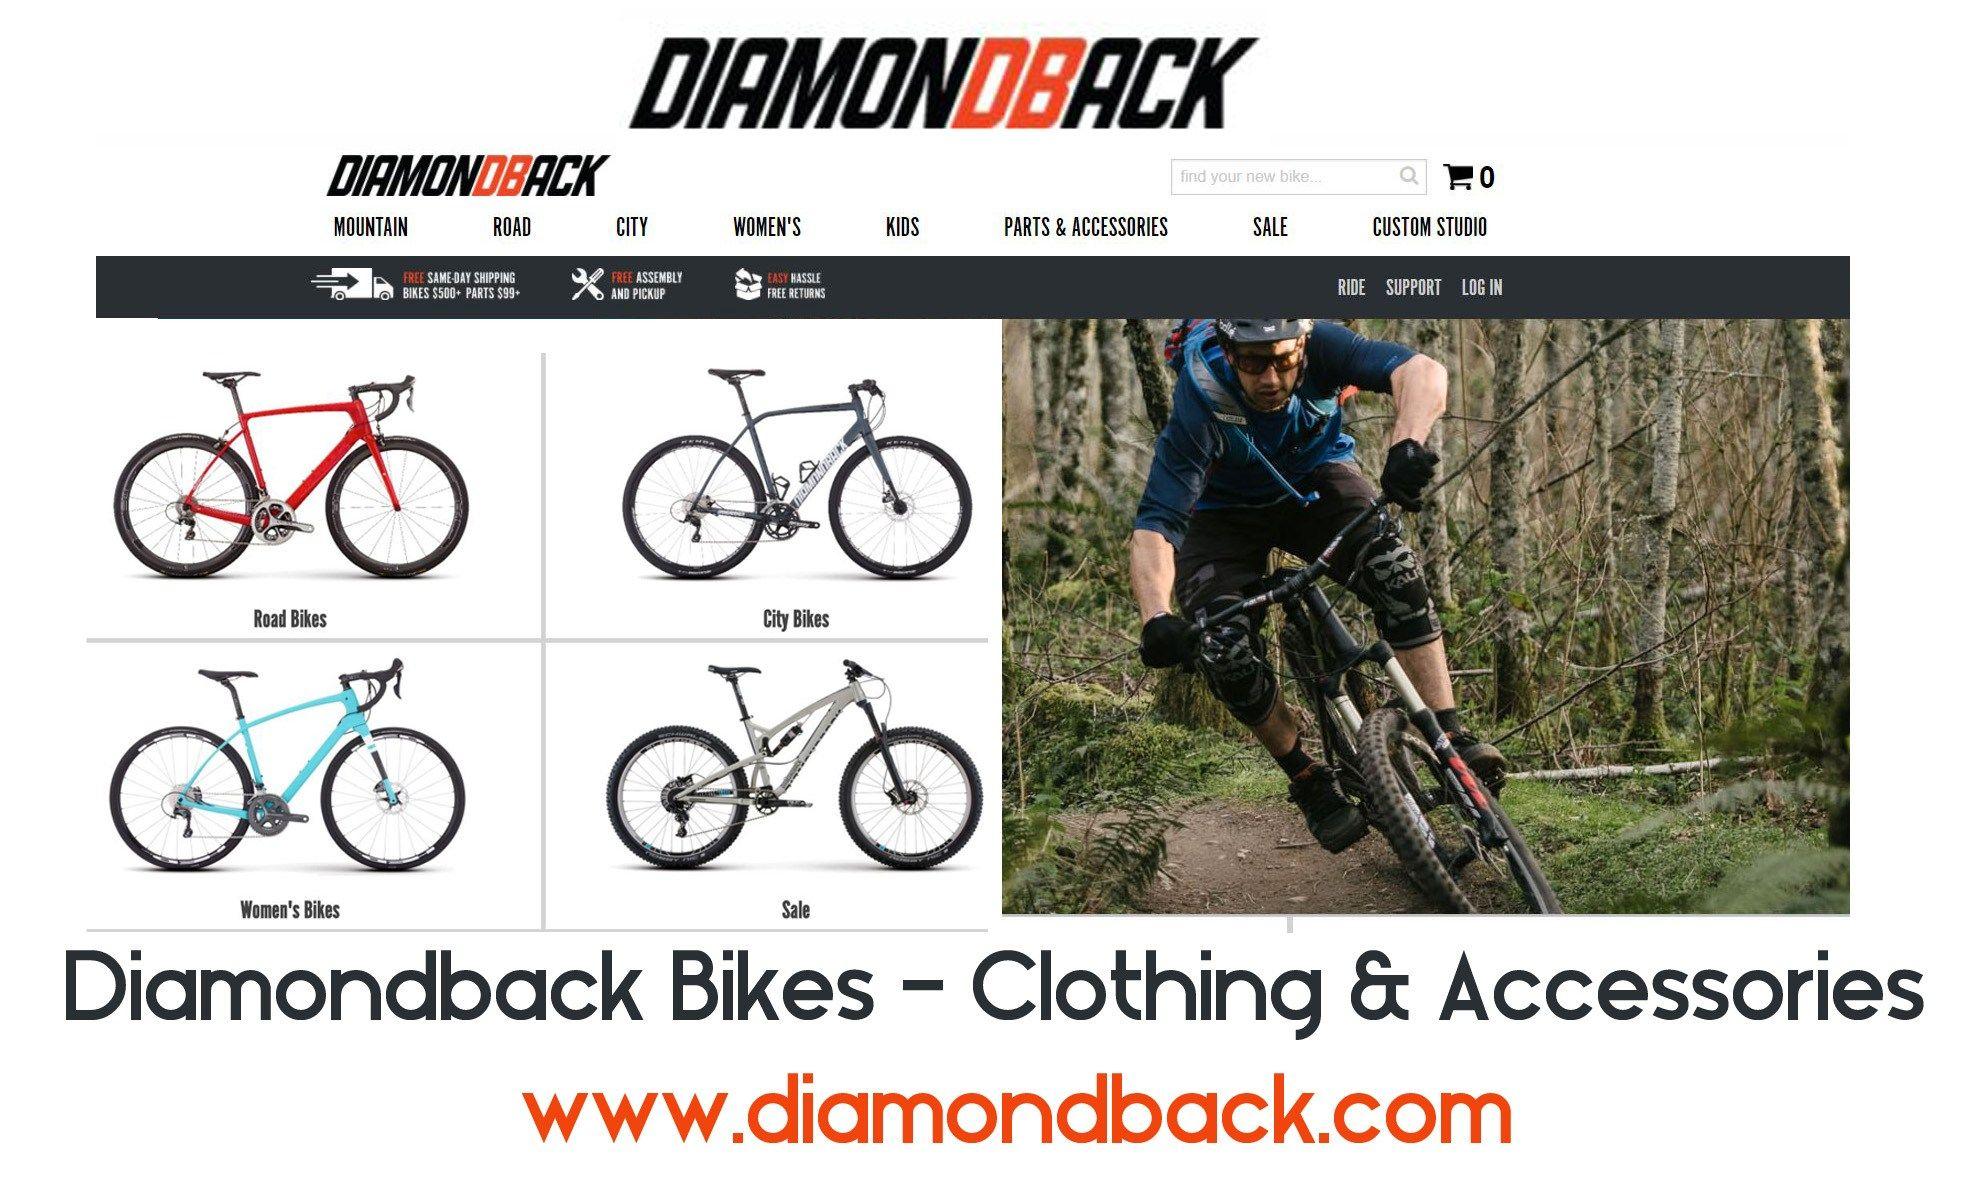 Diamondback Bike Accessories